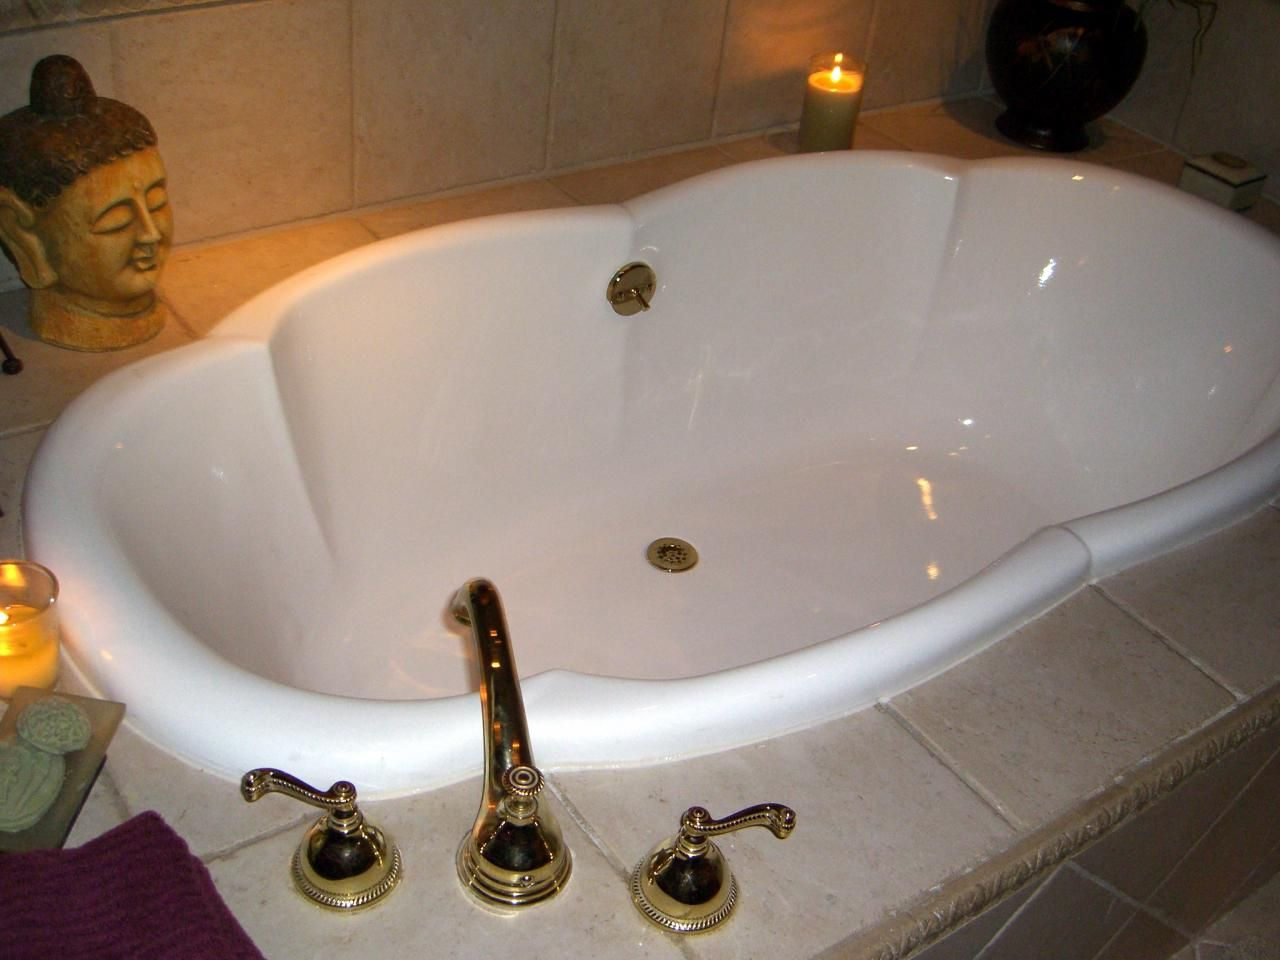 PKB Reglazing : Jacuzzi Jet Bathtub (After) | Bathtub Reglazing ...